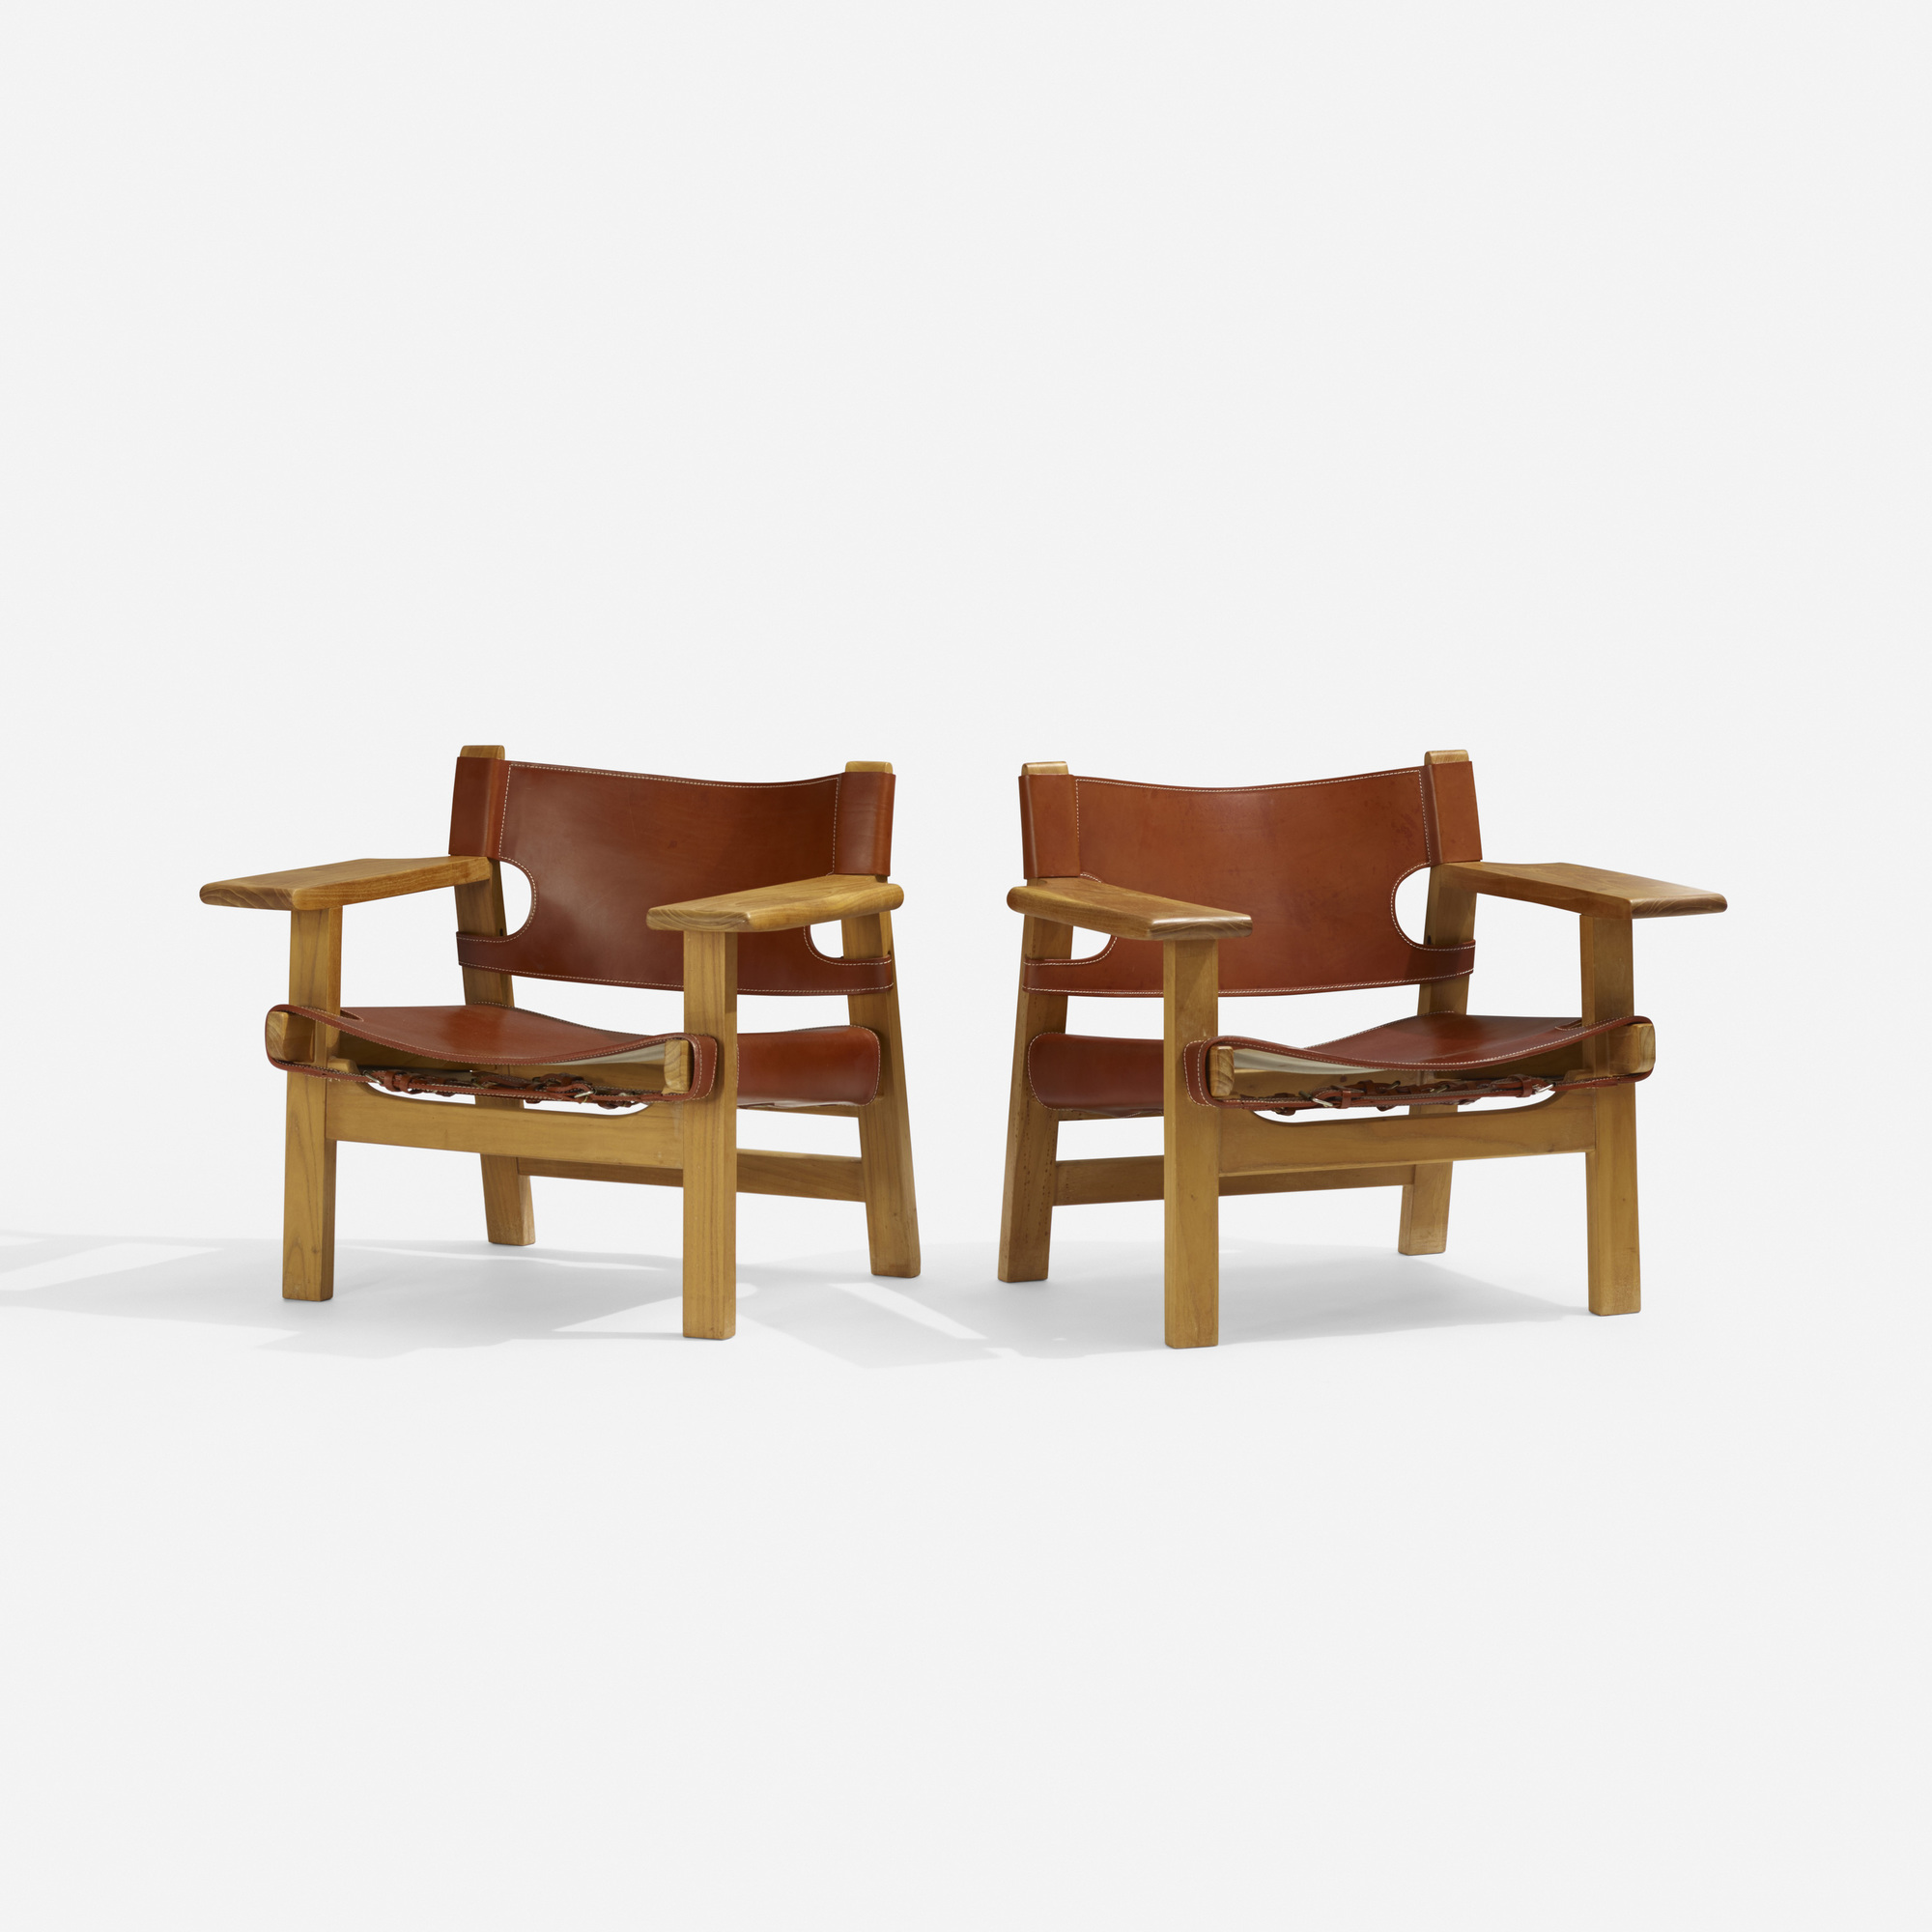 327: Børge Mogensen / Spanish chairs, pair (2 of 3)